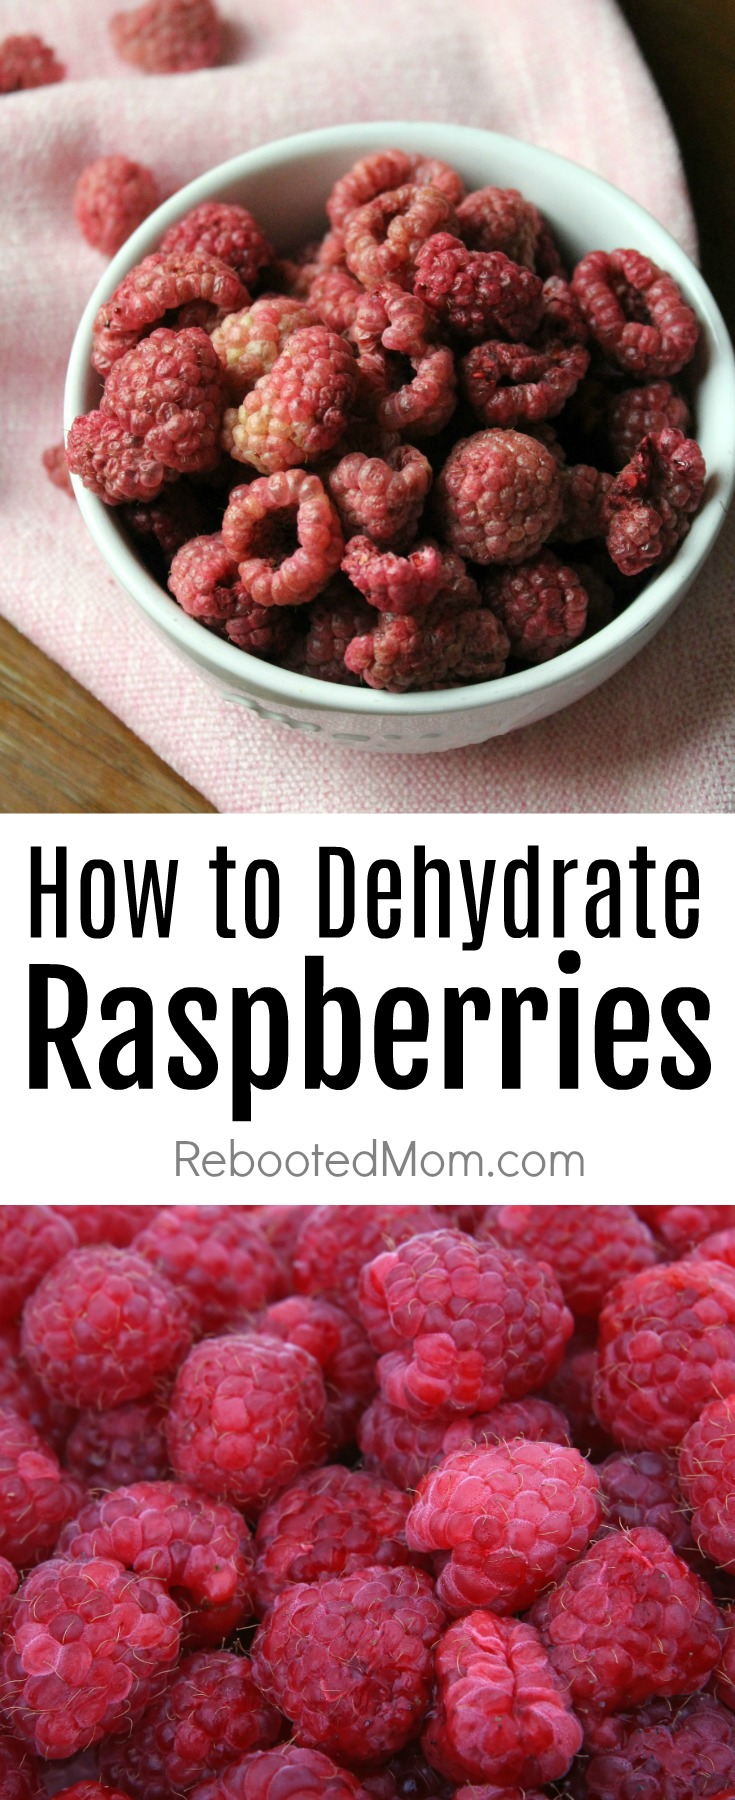 How to Dehydrate Raspberries